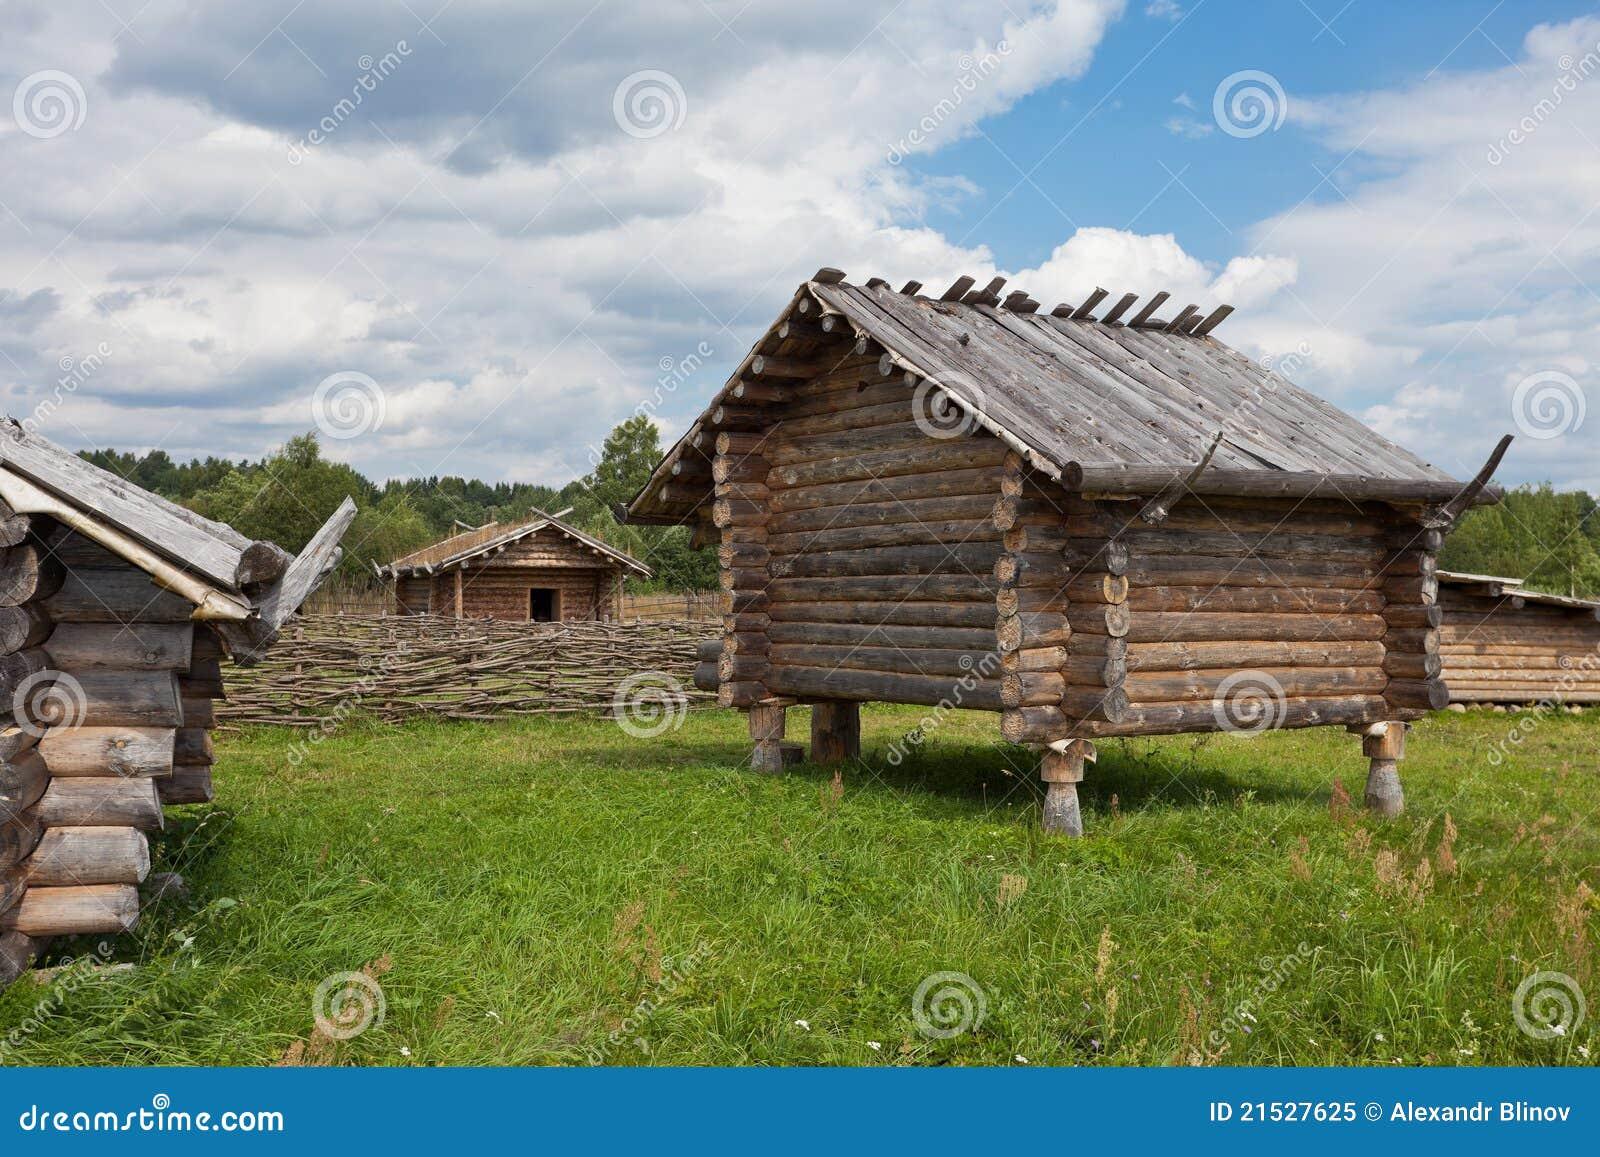 Casa de madera rusa tradicional antigua imagen de archivo - Ver casas de madera ...